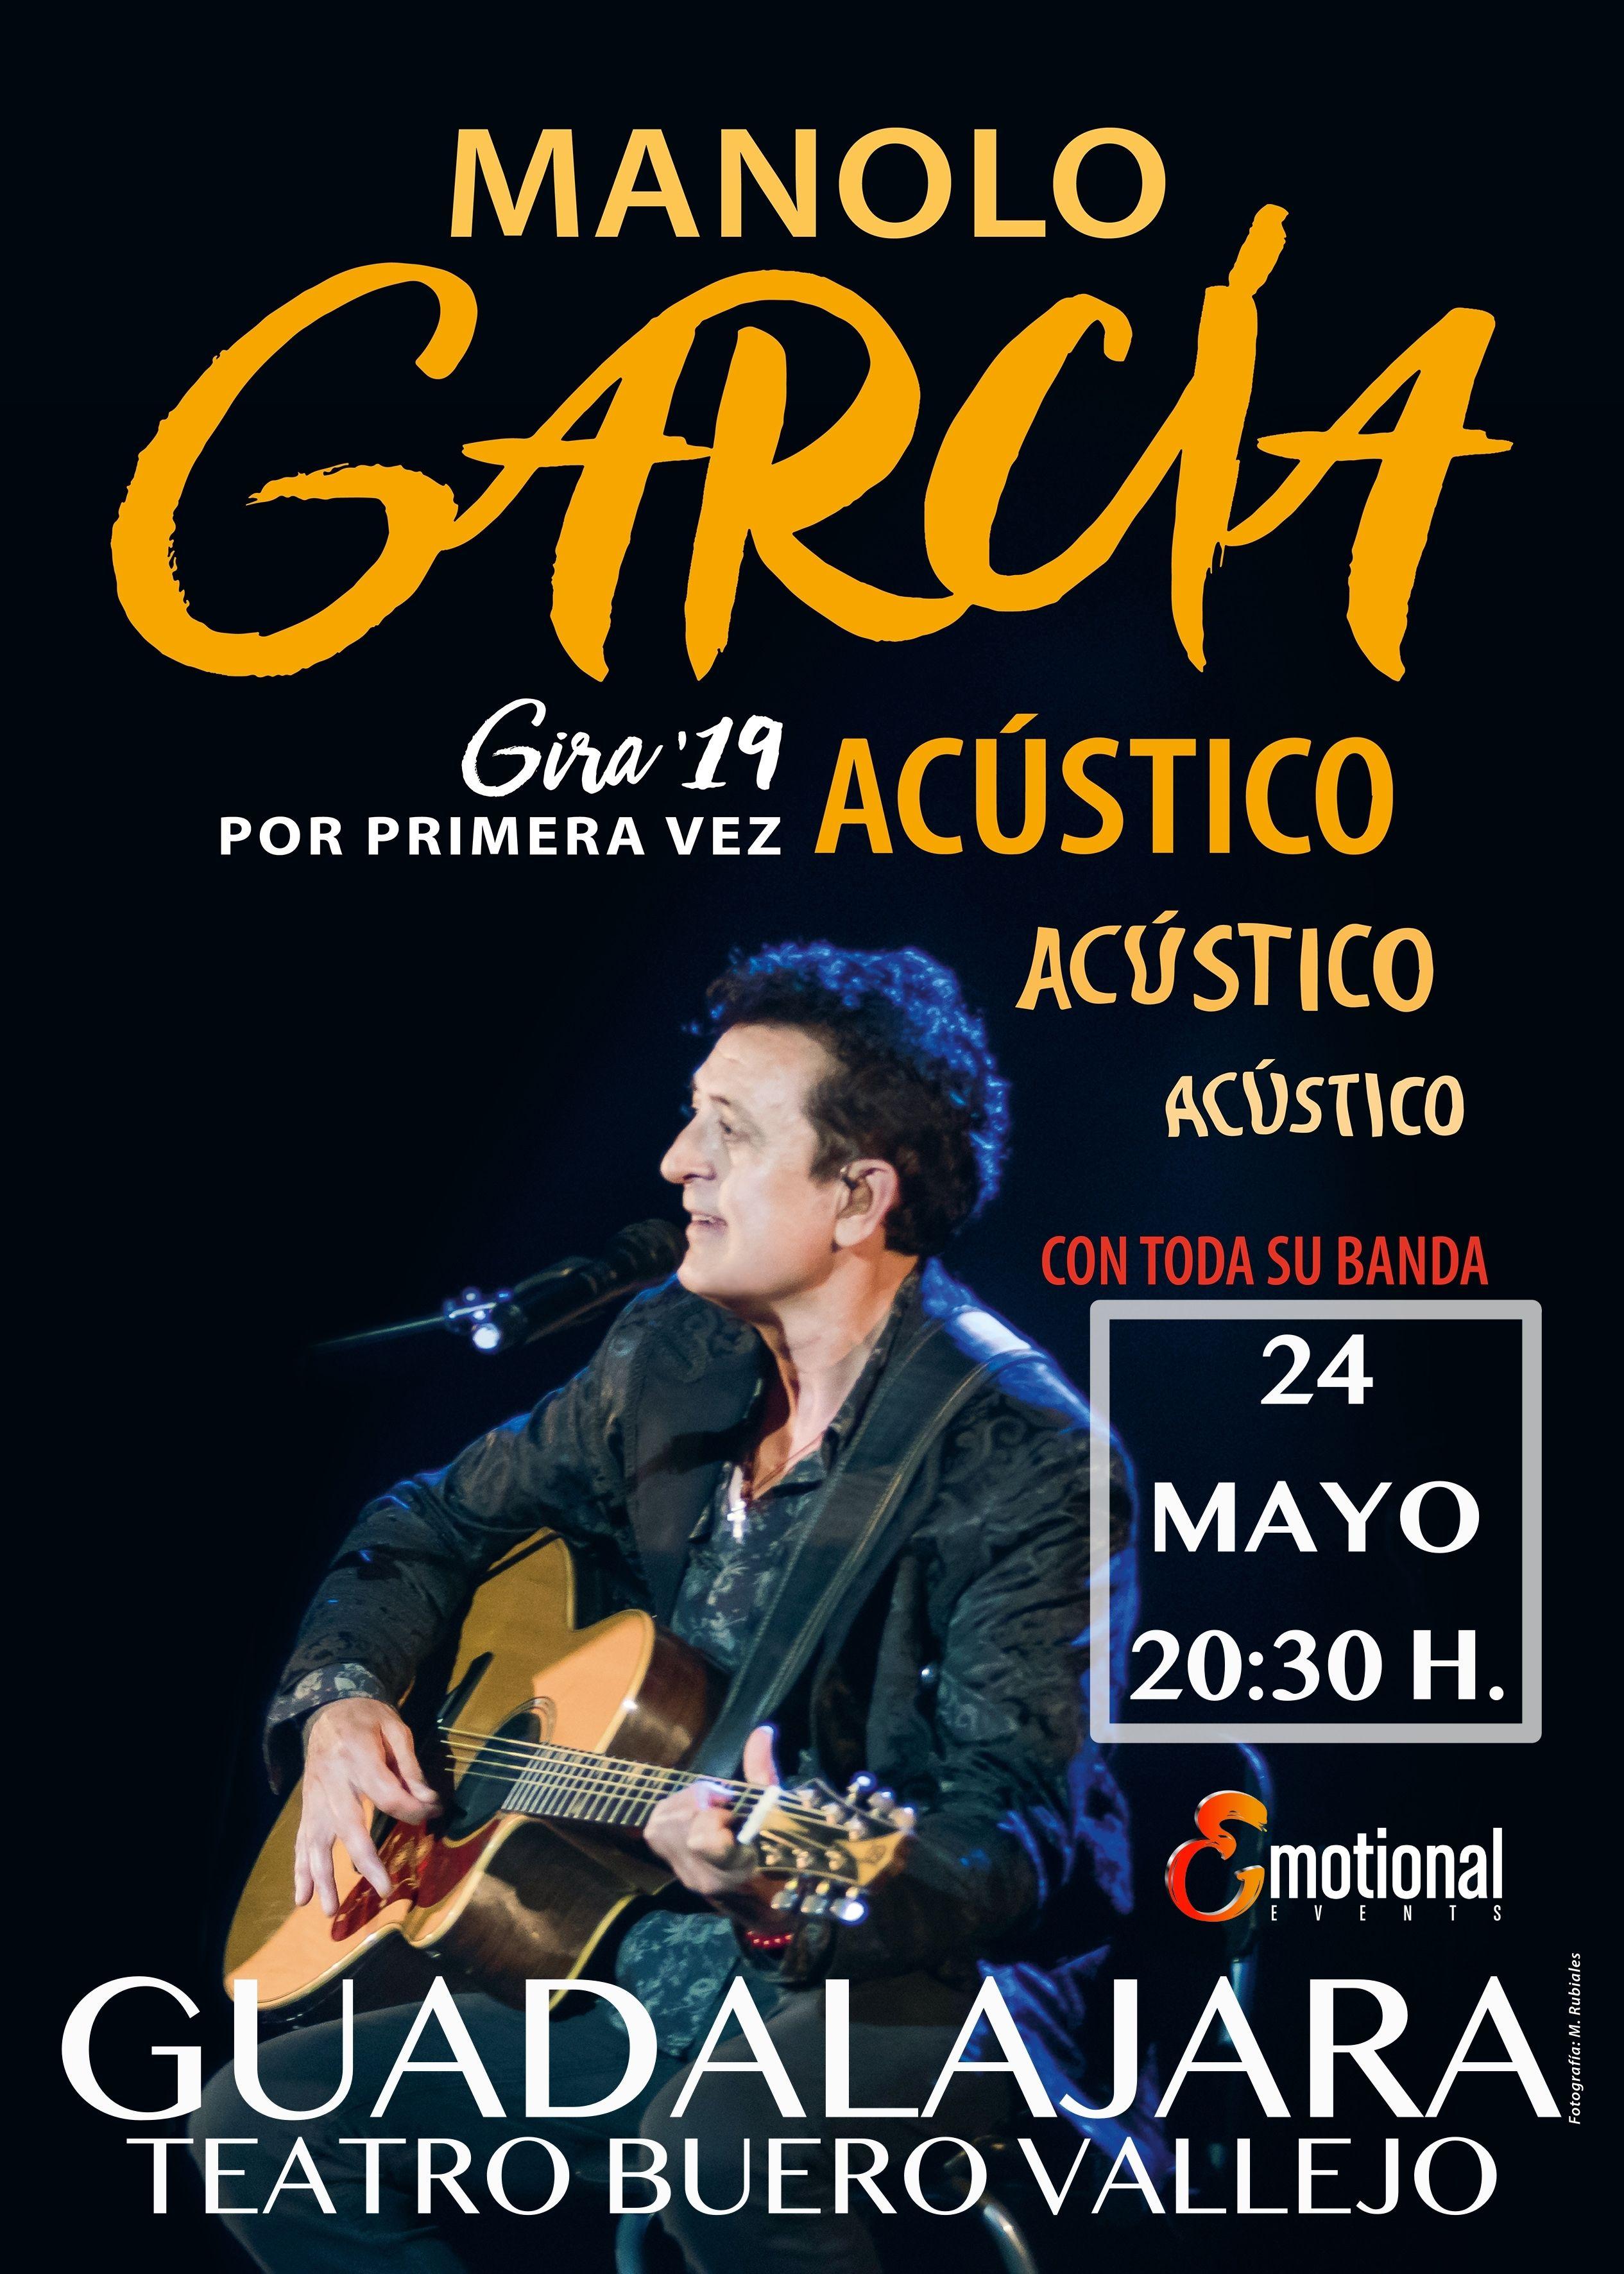 MANOLO GARCIA ACUSTICO Guadalajara emotional